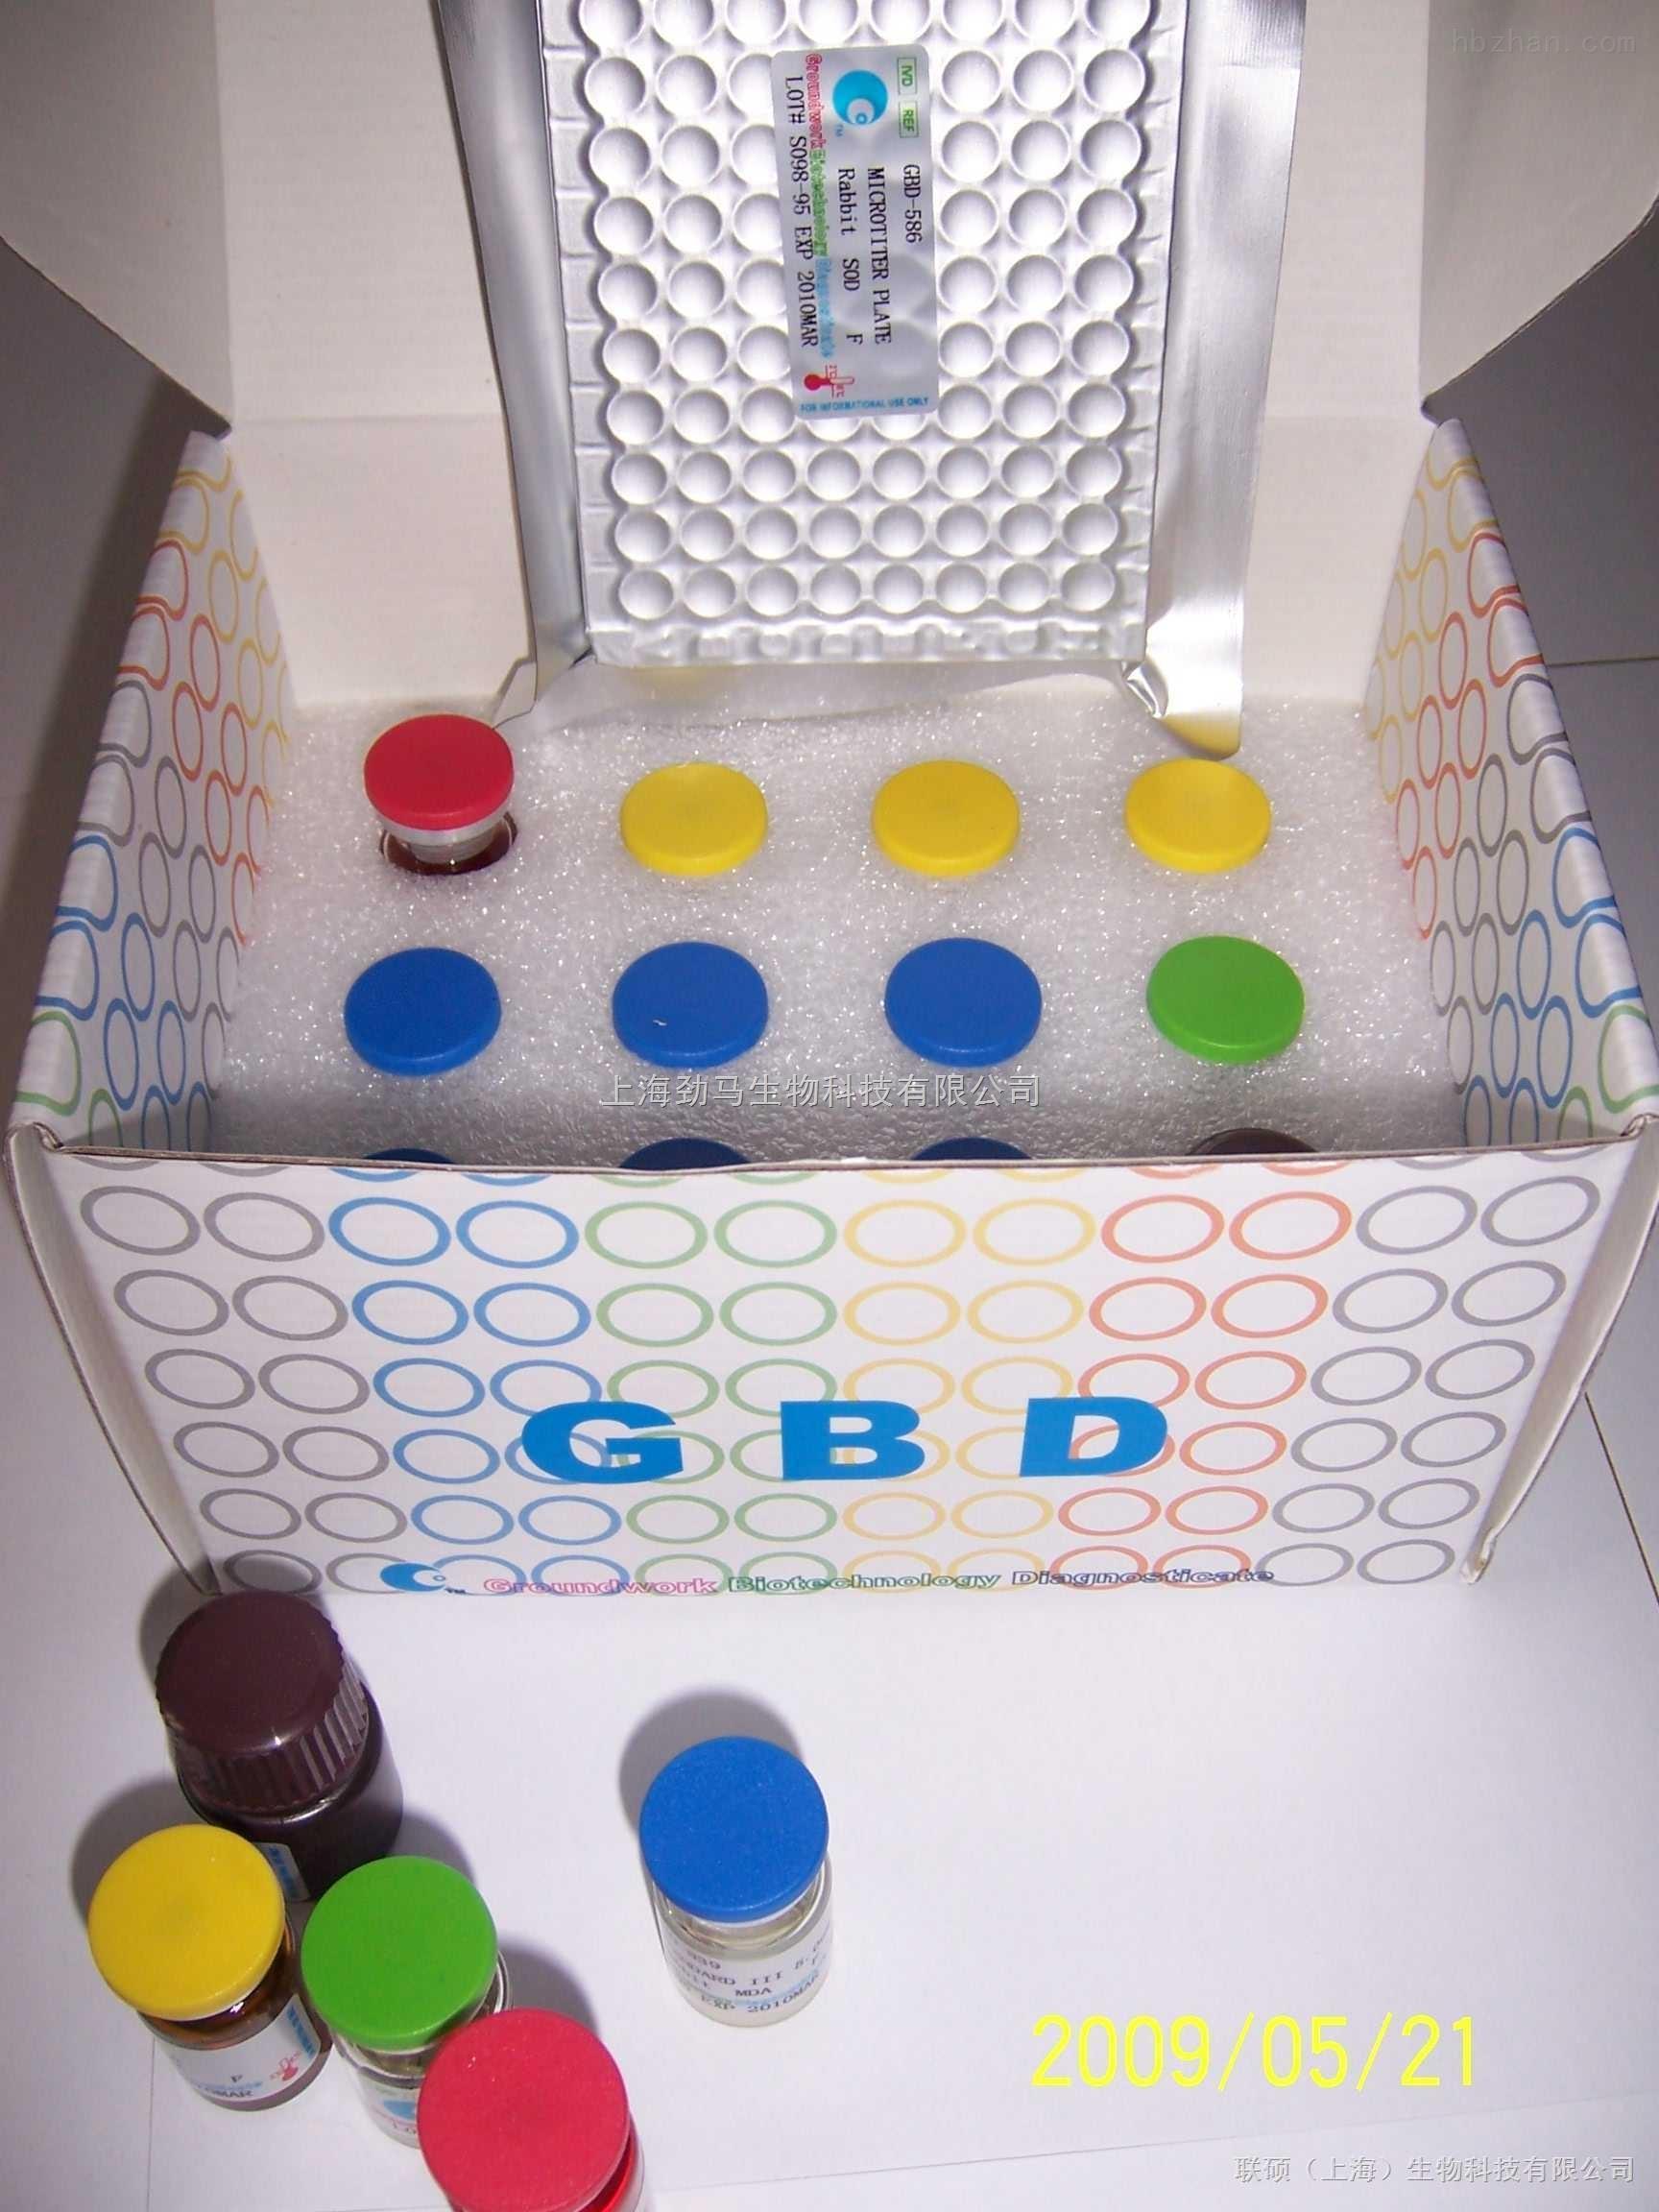 pl)elisa试剂盒